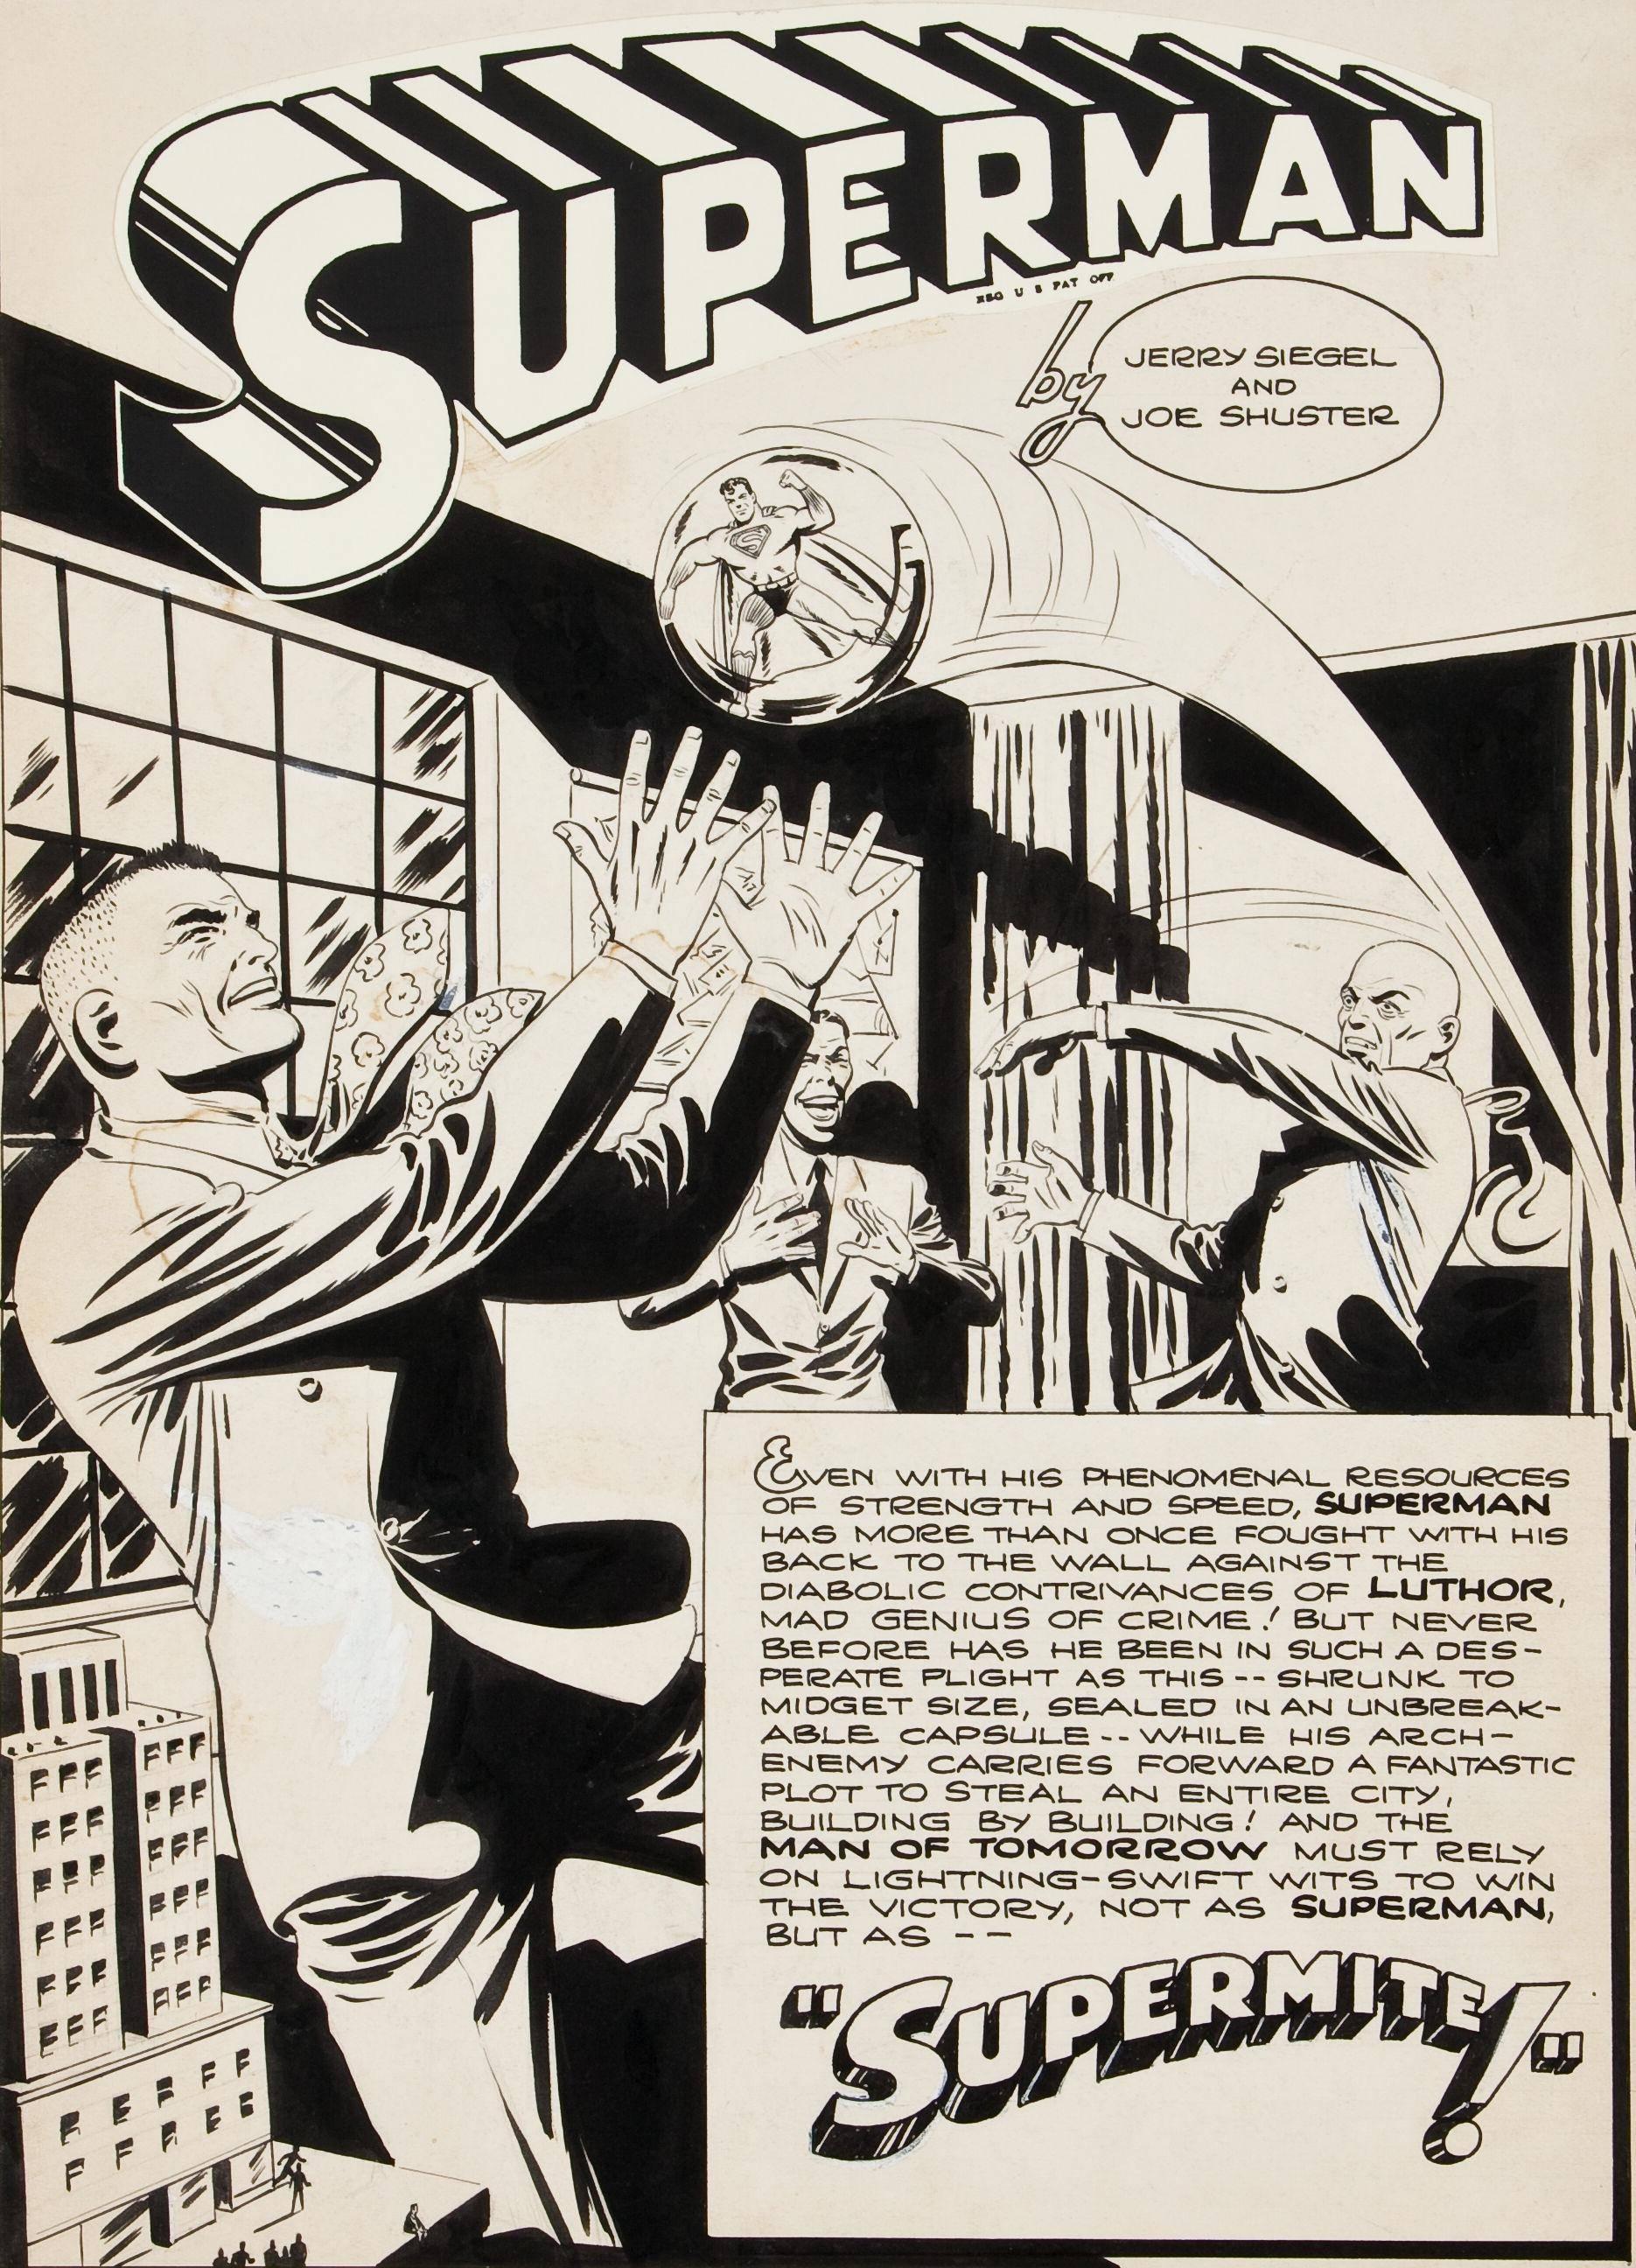 Superman 1939-1986 Miscellanea [13 of 26] [1944] Superman in Supermite unpublished Golden Age story cbz